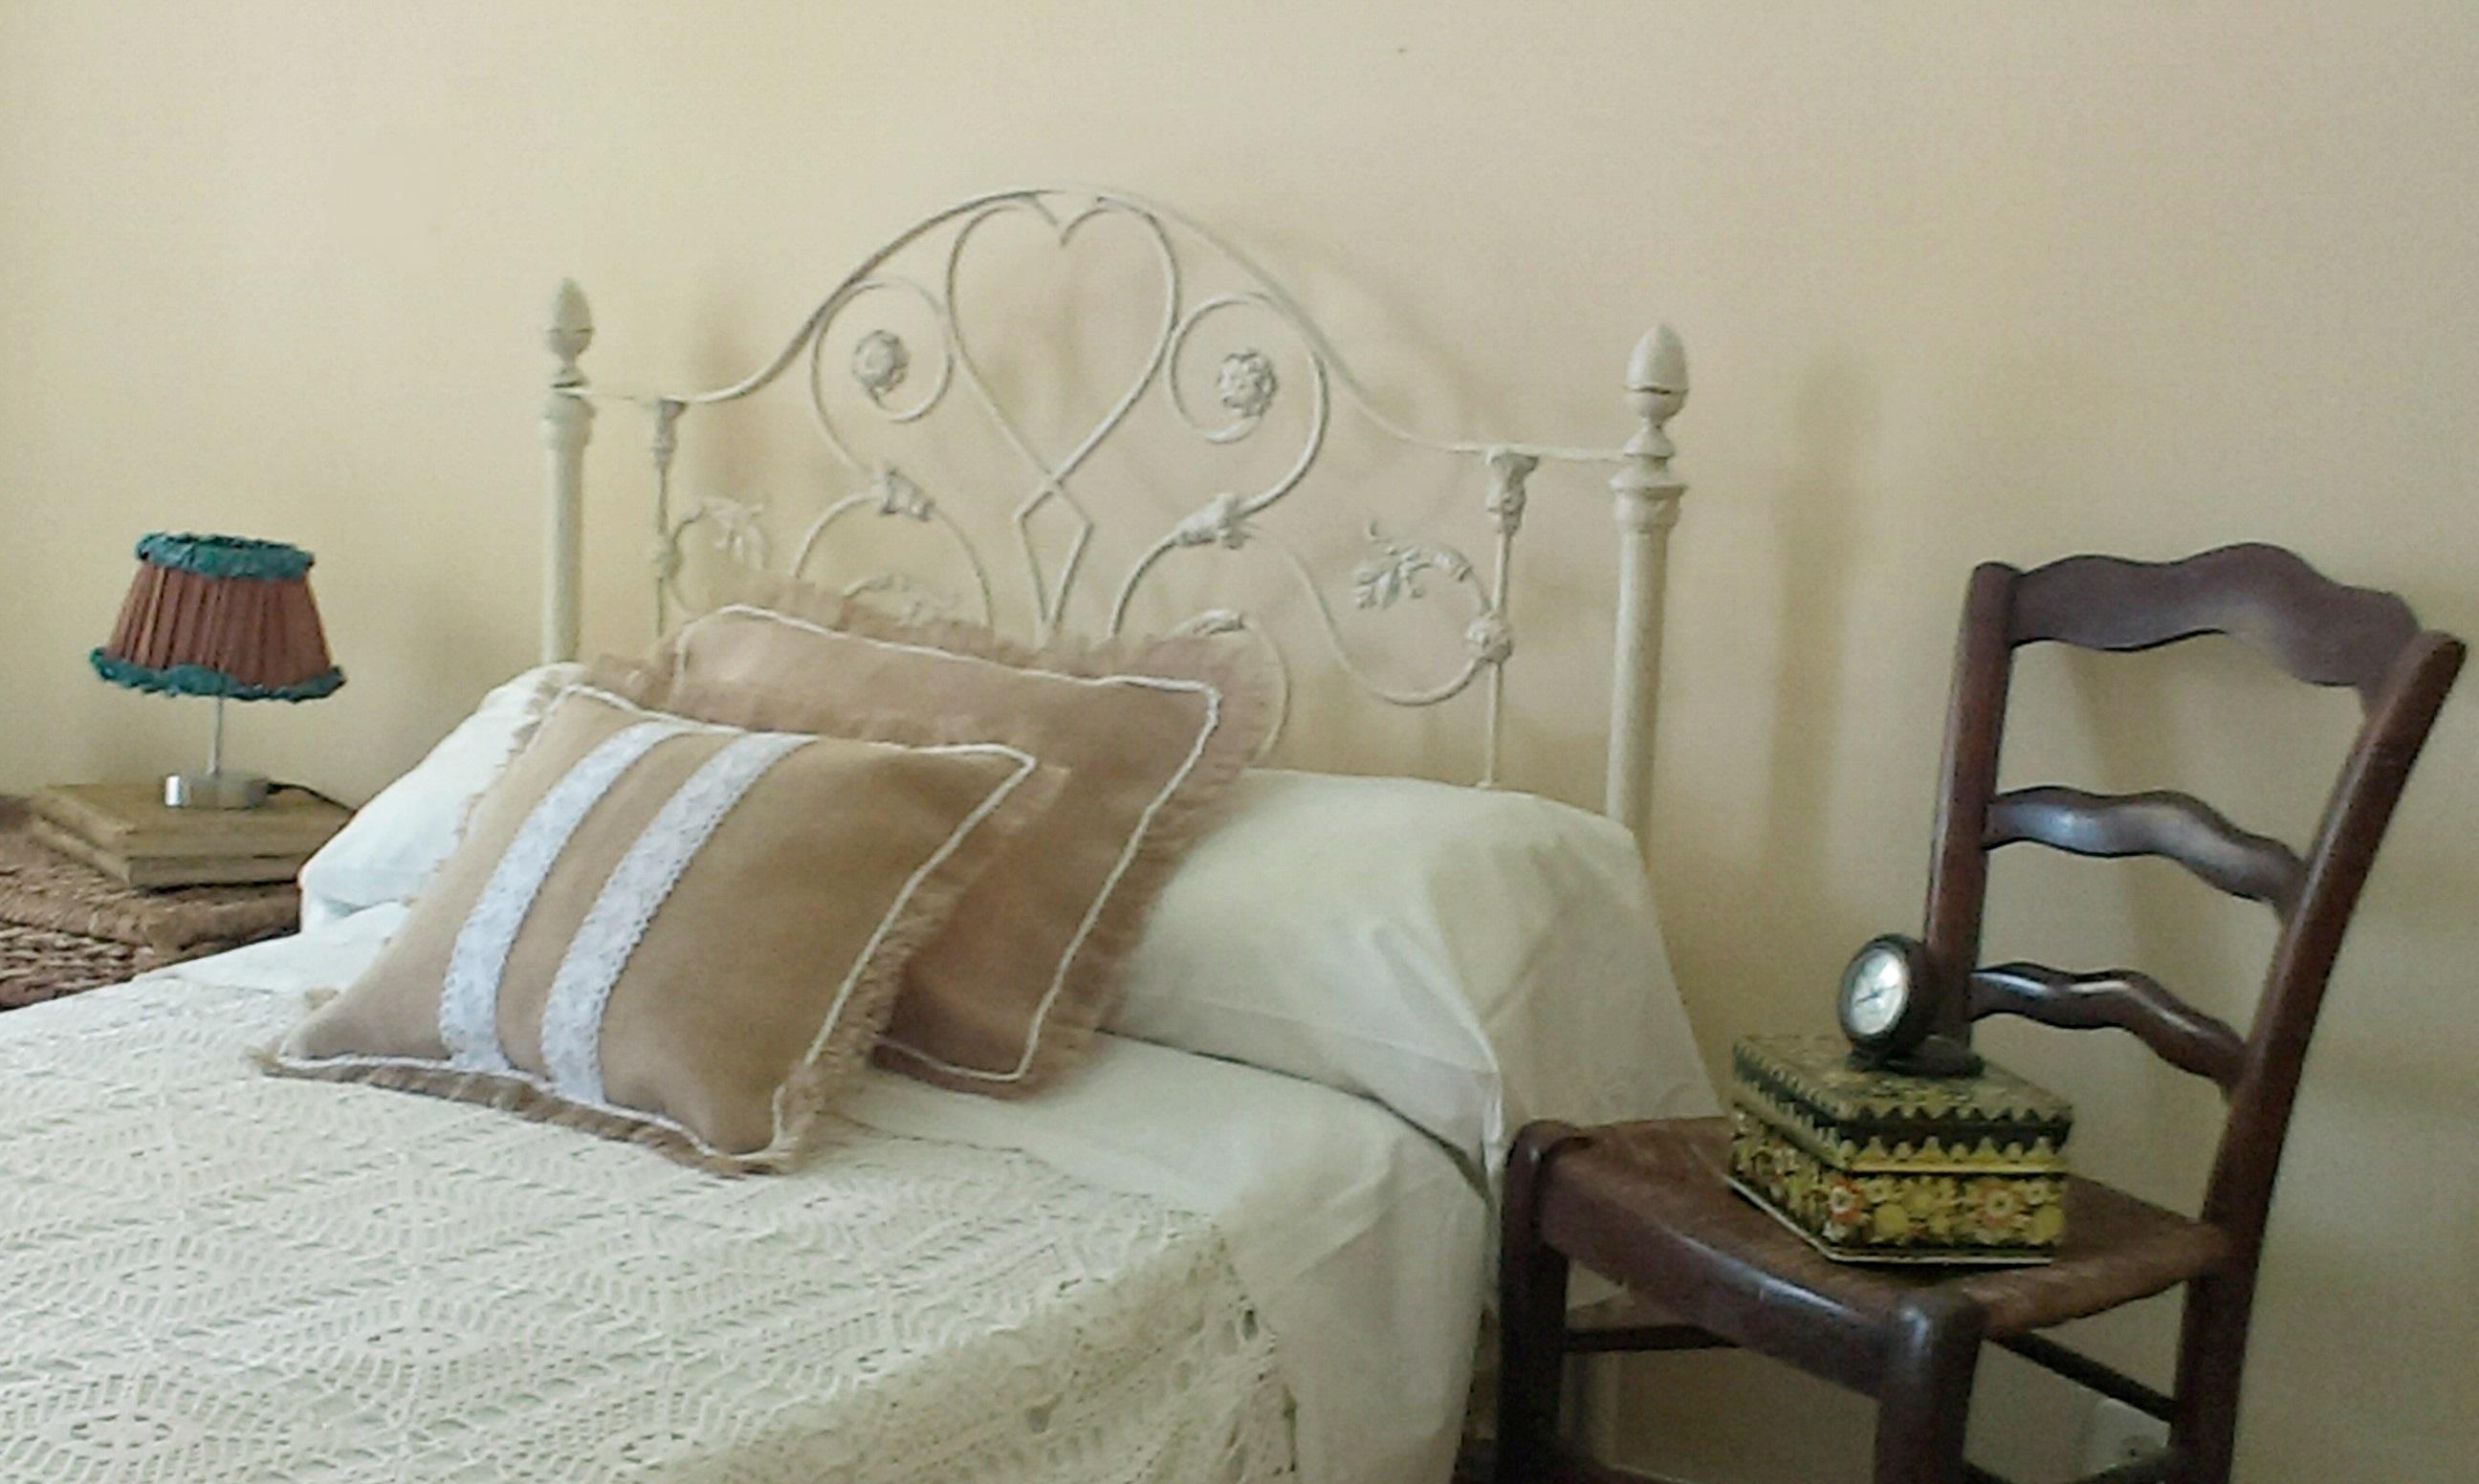 Antigua cama de forja estilo shabby shabby old iron bed - Camas estilo romantico ...